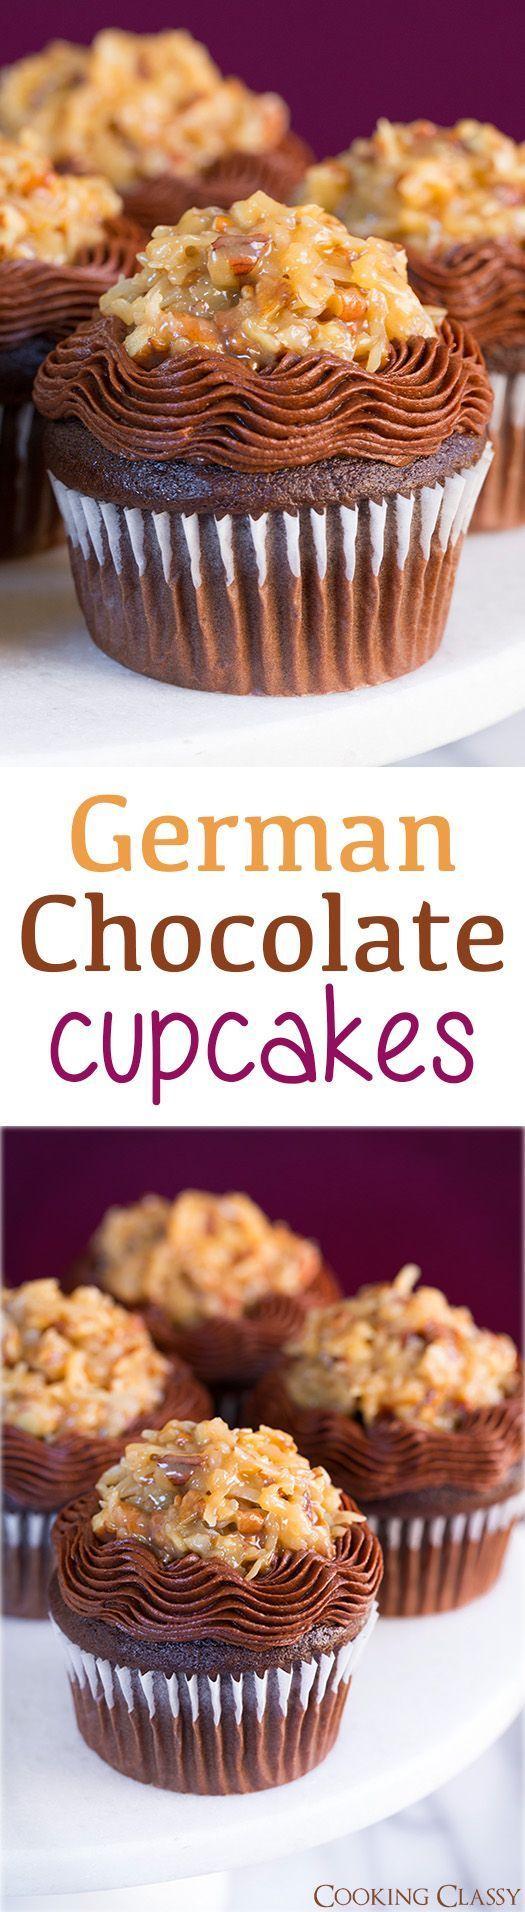 German Chocolate Cupcakes | Recipe | Pinterest | German chocolate ...